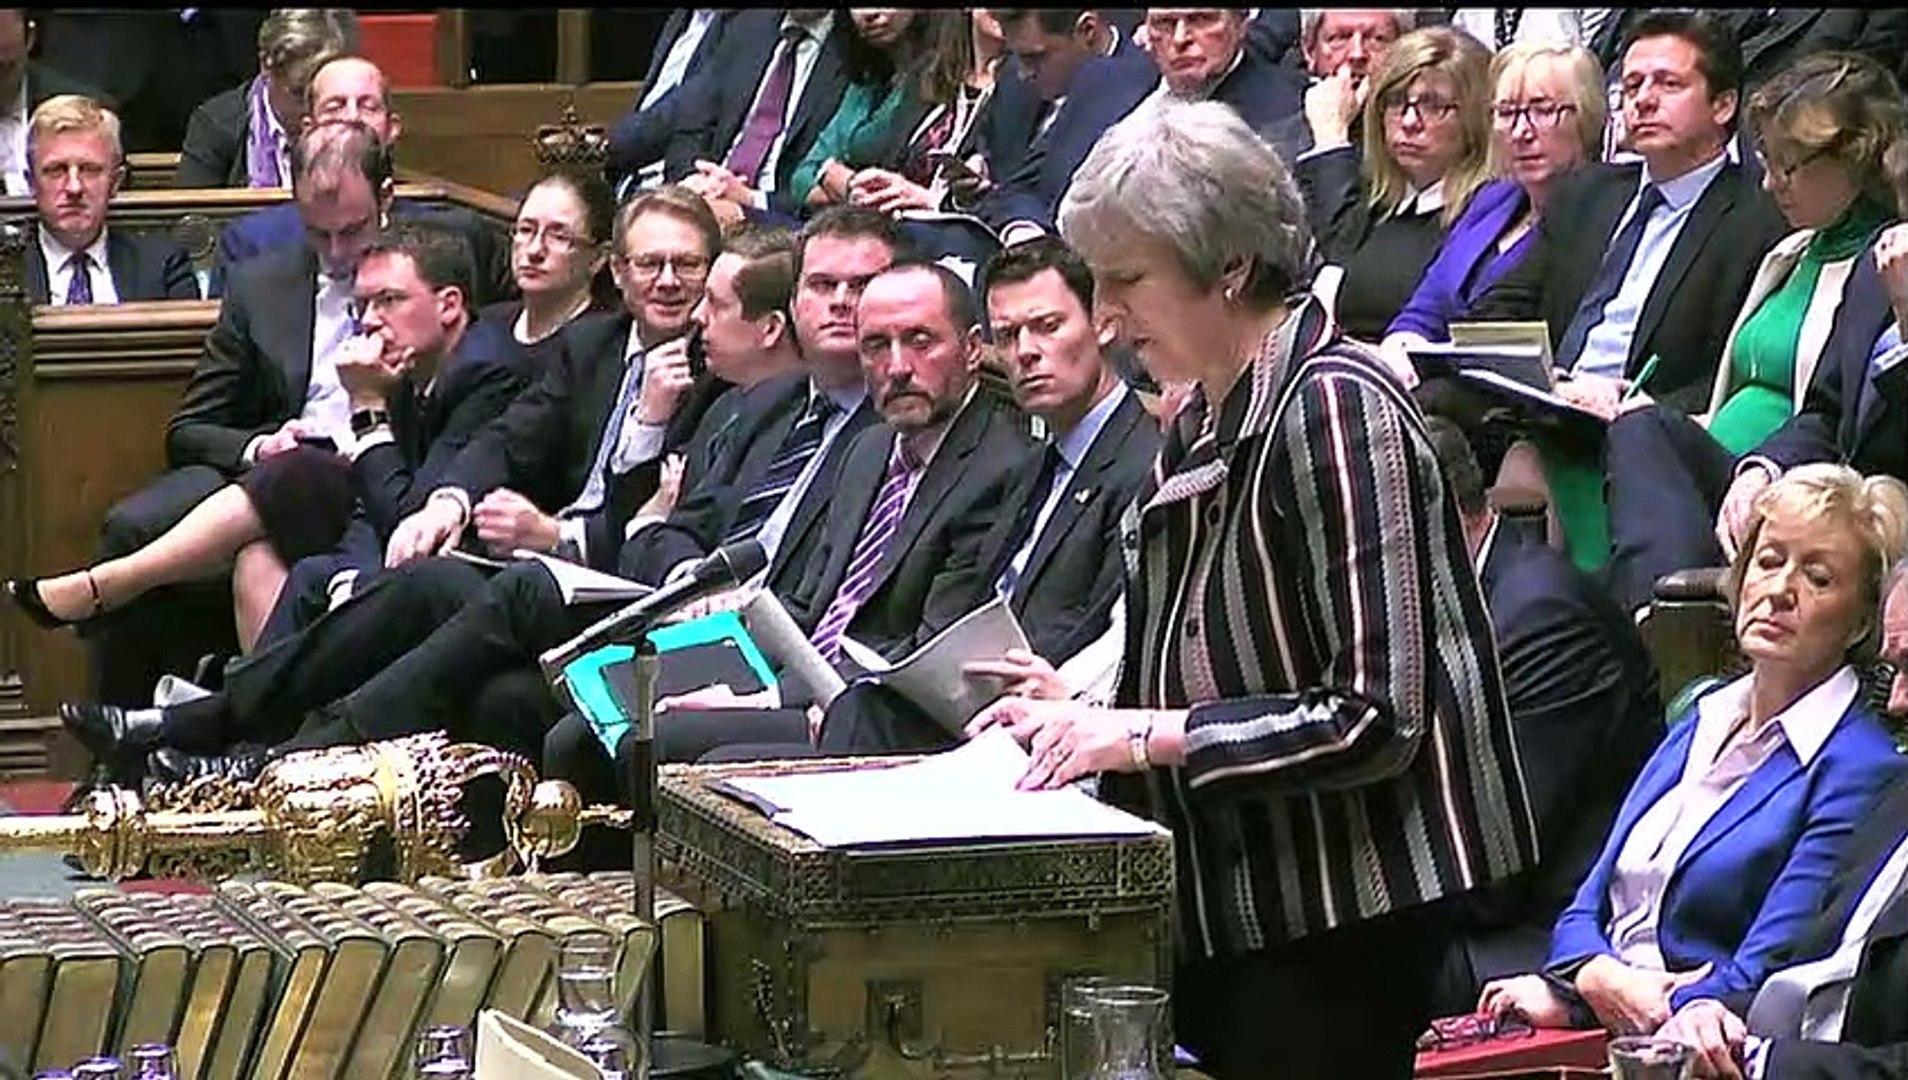 Corbyn slams May's Brexit deal as